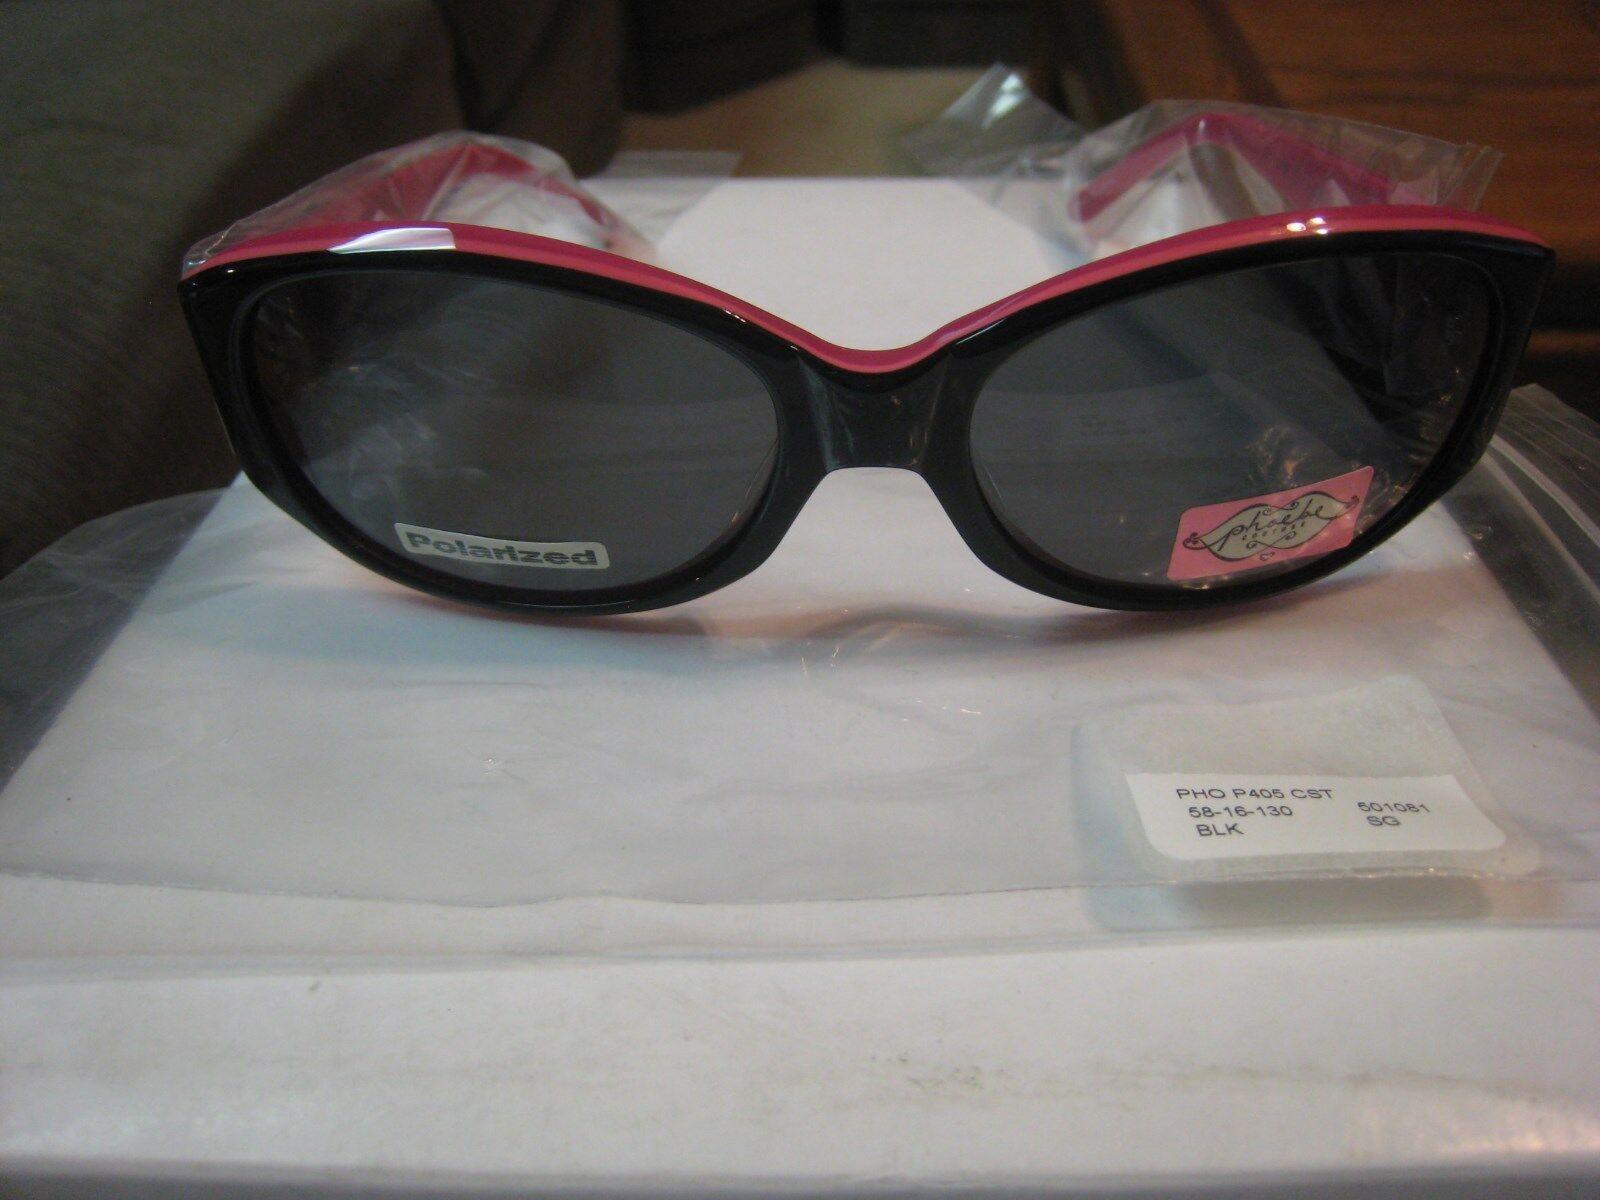 e49272a314e6 UPC 751658915726 product image for Phoebe Couture Polarized Sunglasses- women's P405-black -nwt